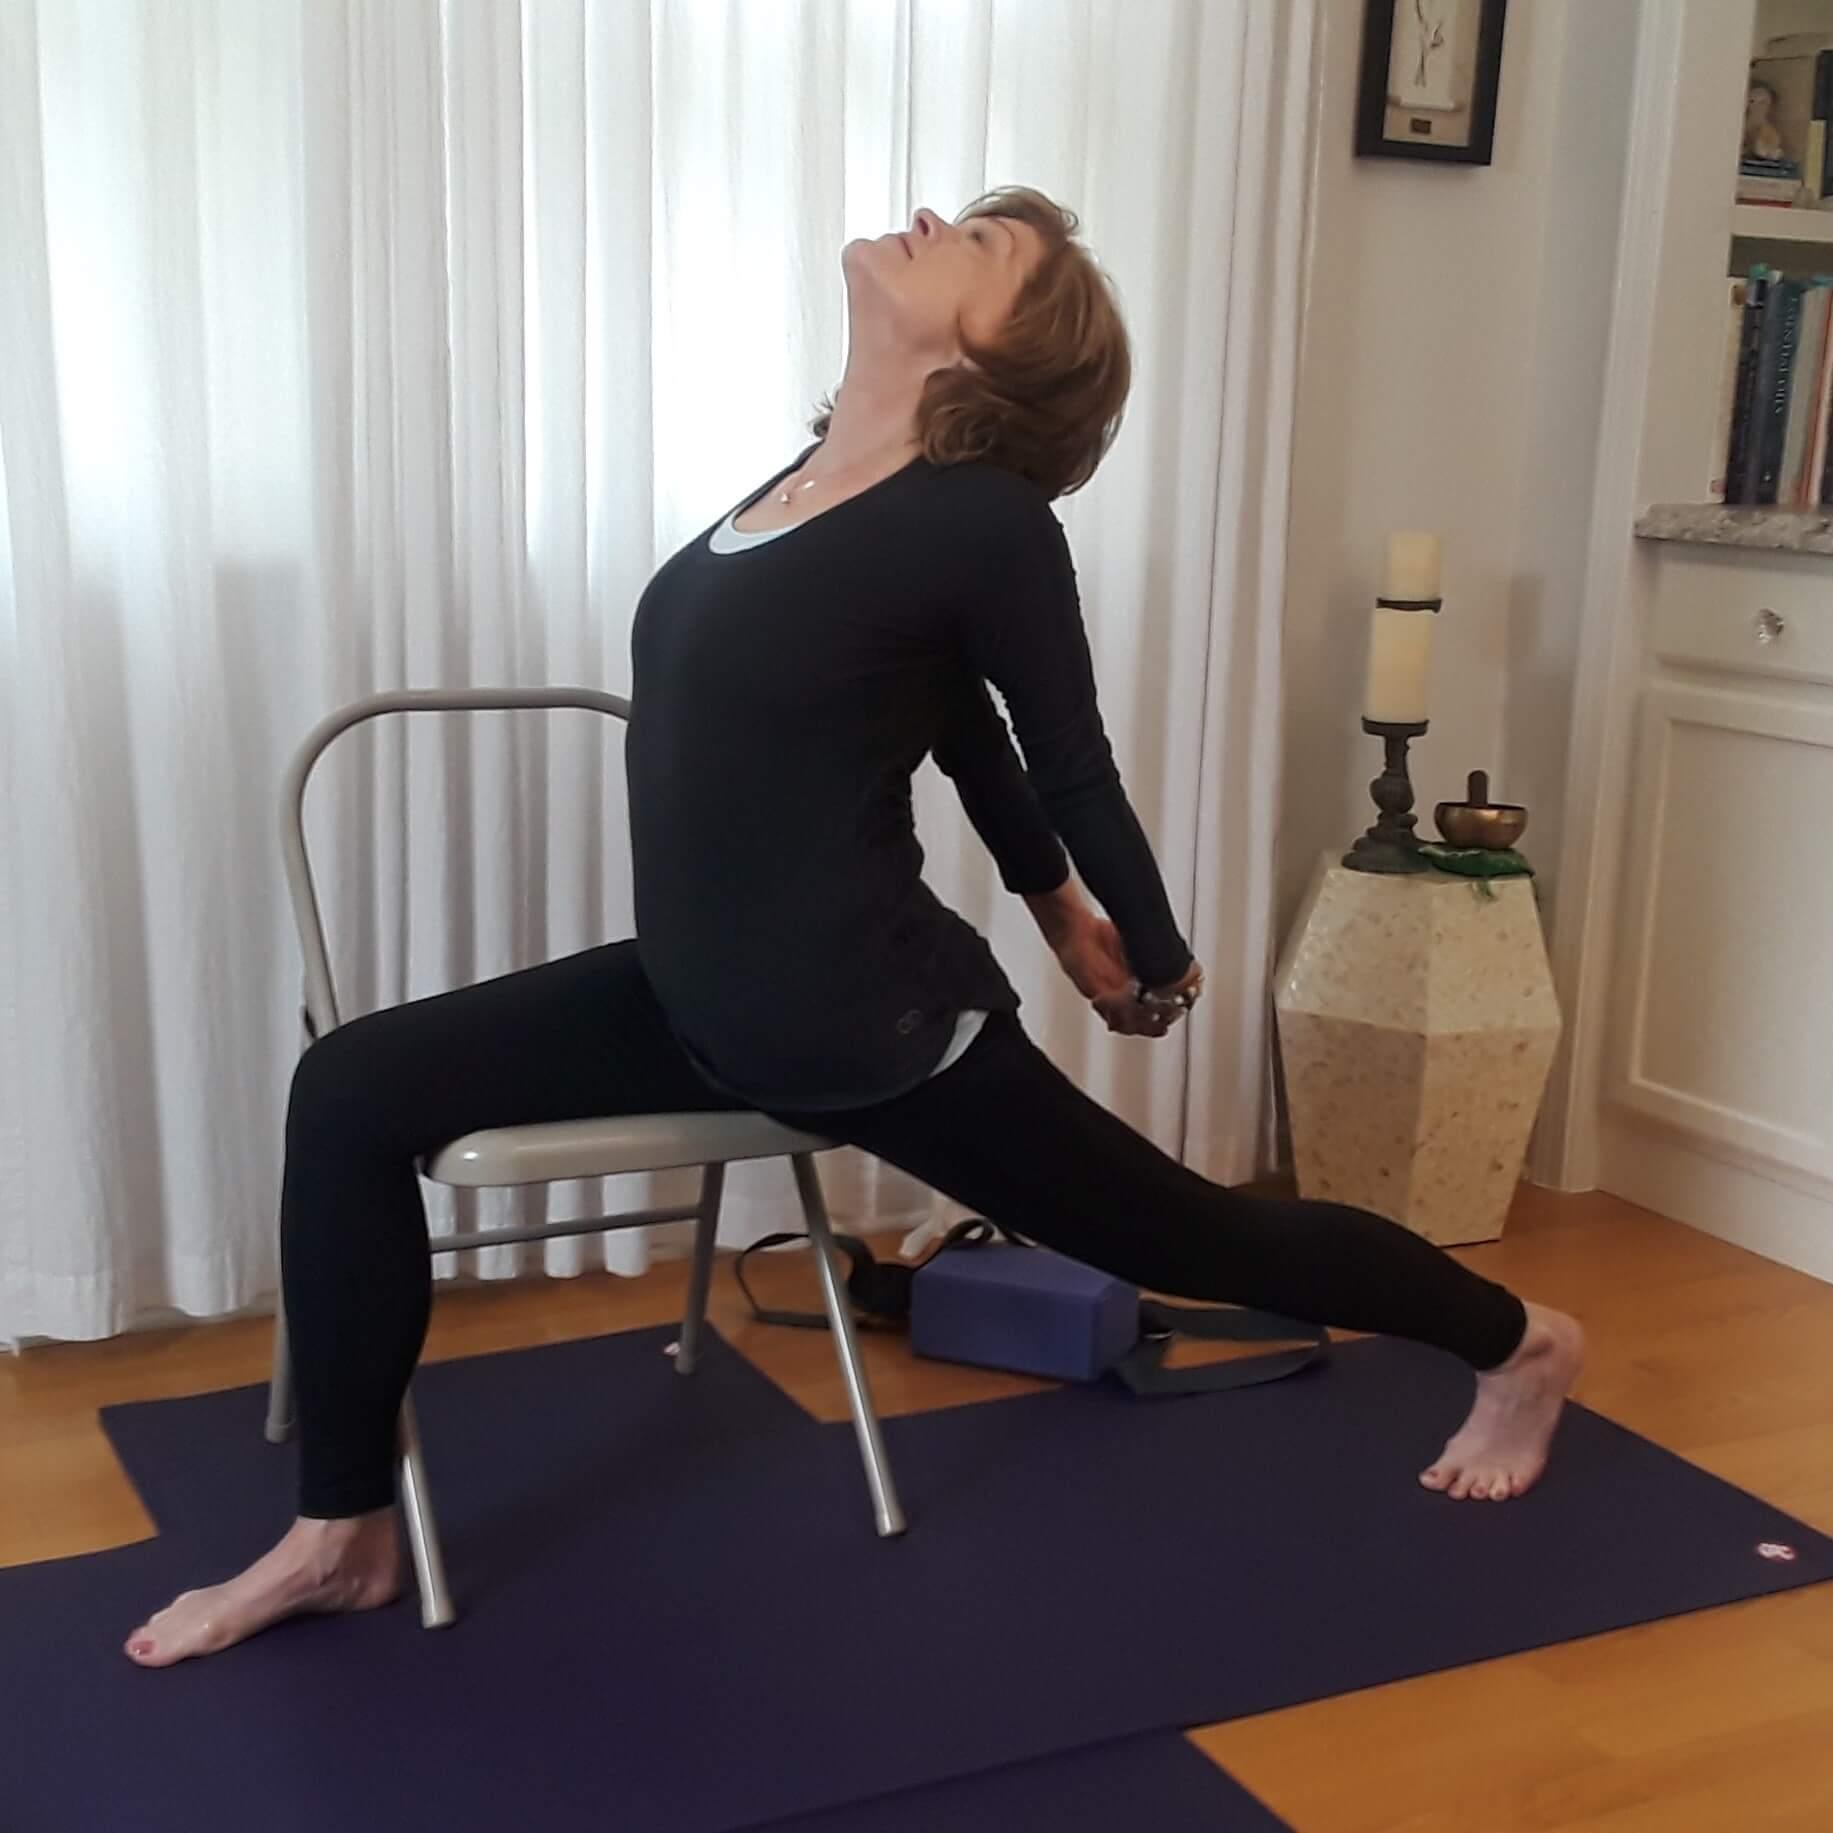 Chair Yoga - Challenge for Core & Balance